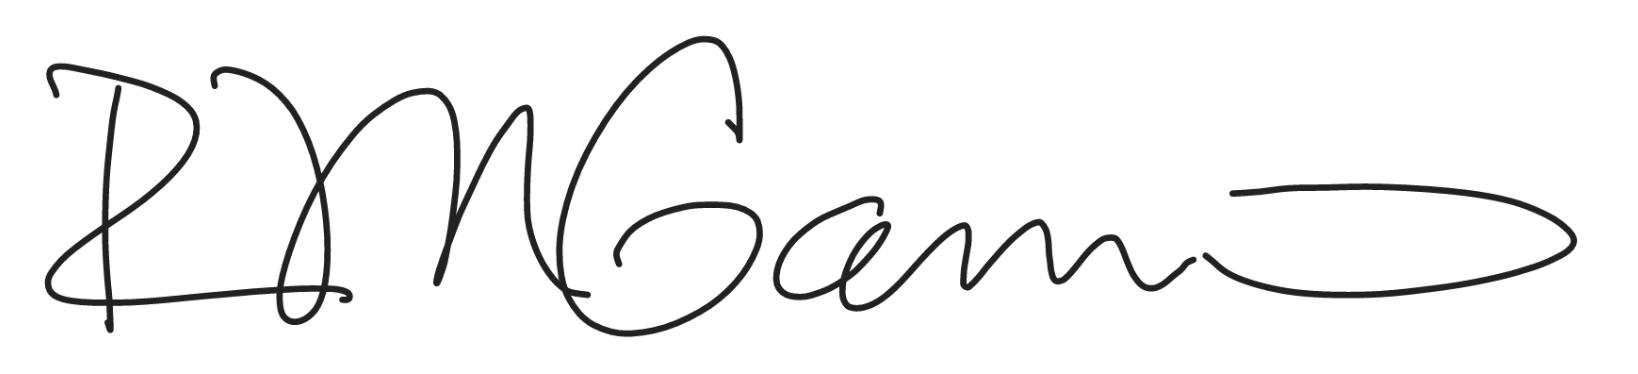 RMG signature.png